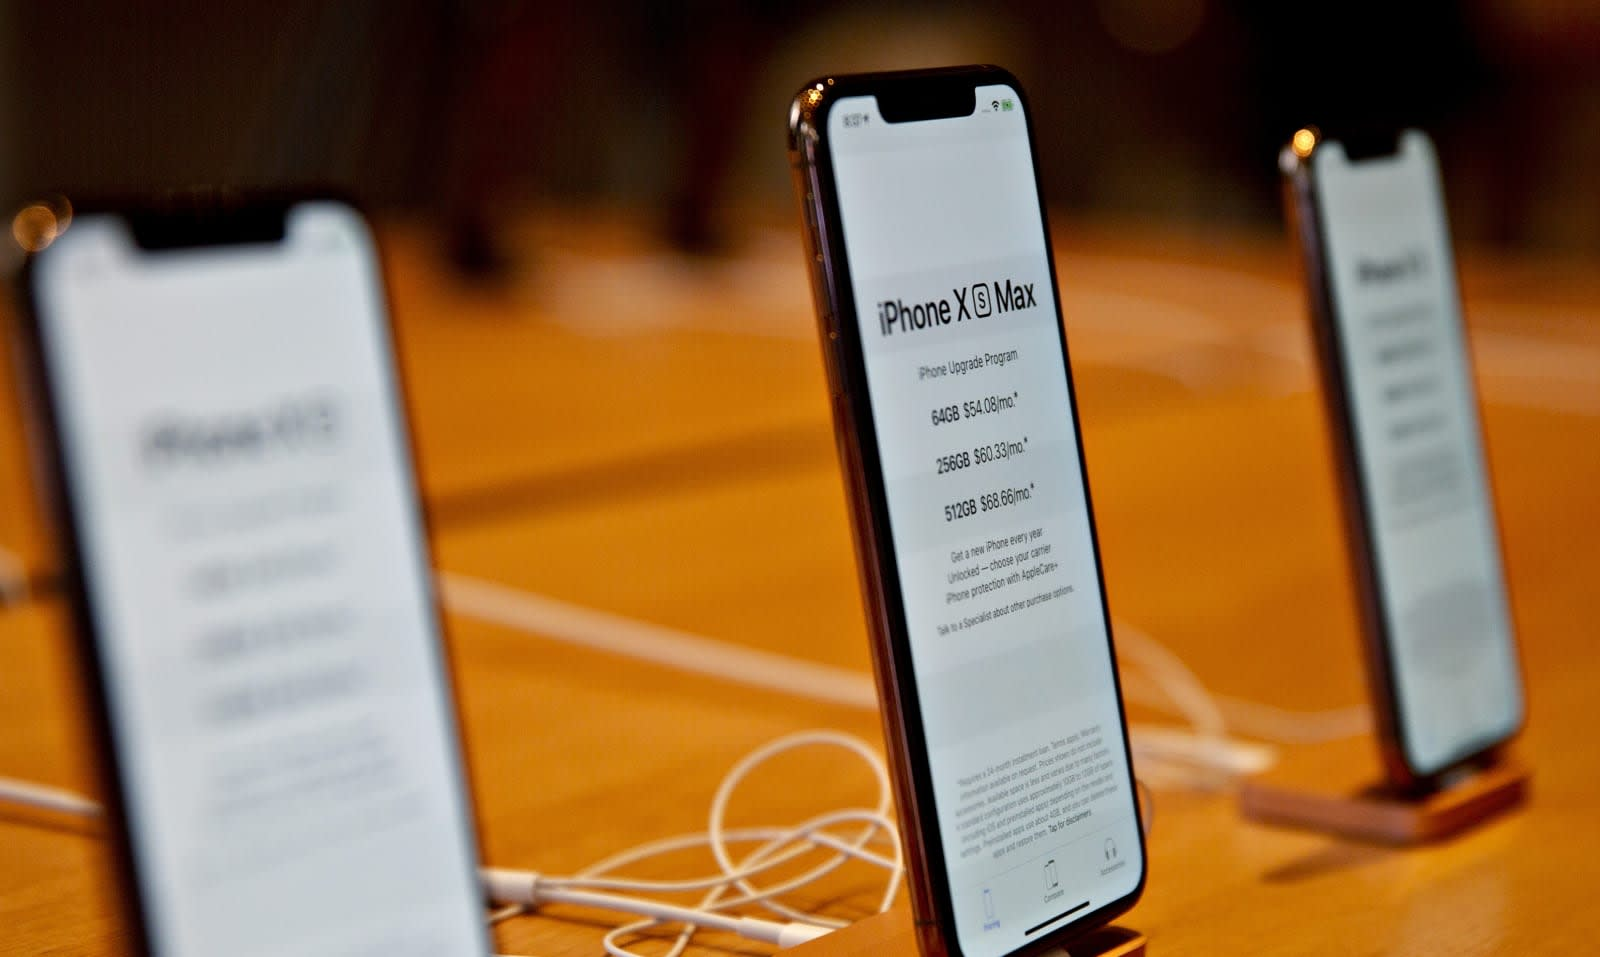 ITC judge denies Qualcomm's request, won't stop iPhone imports